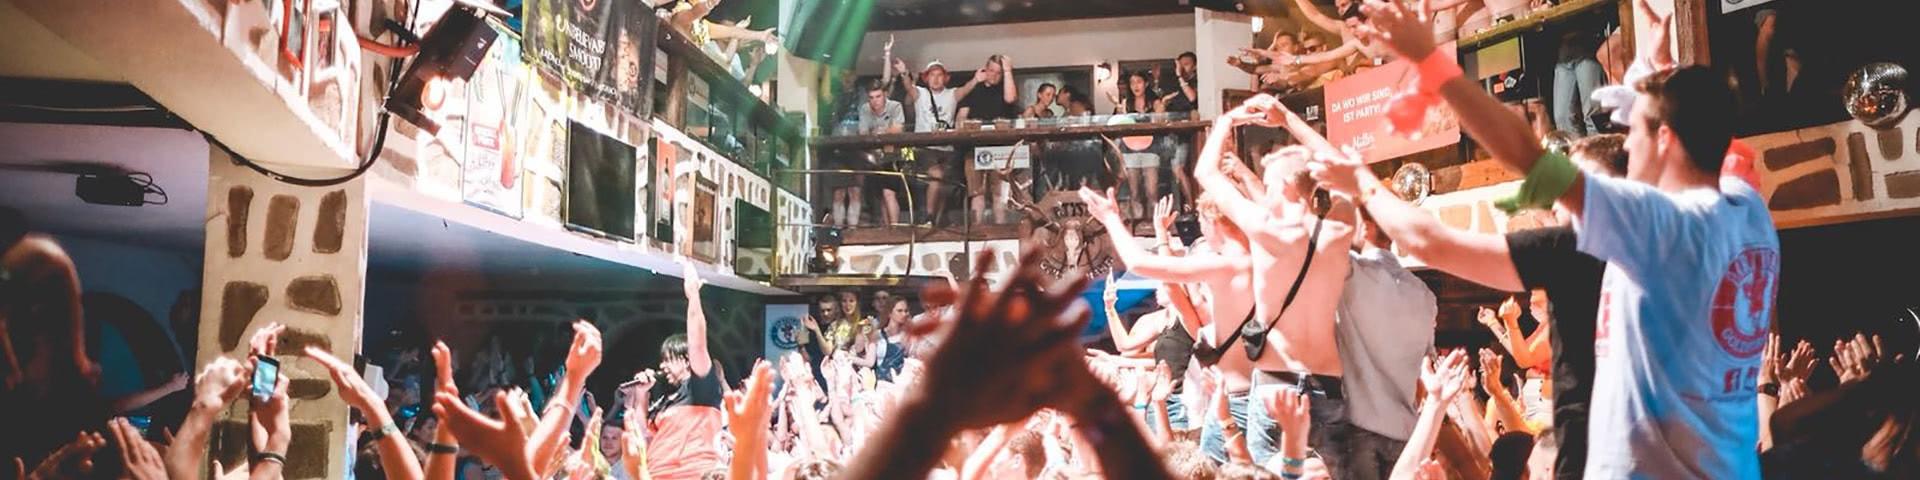 Ausgelassene Party im Partystadel in Bulgarien